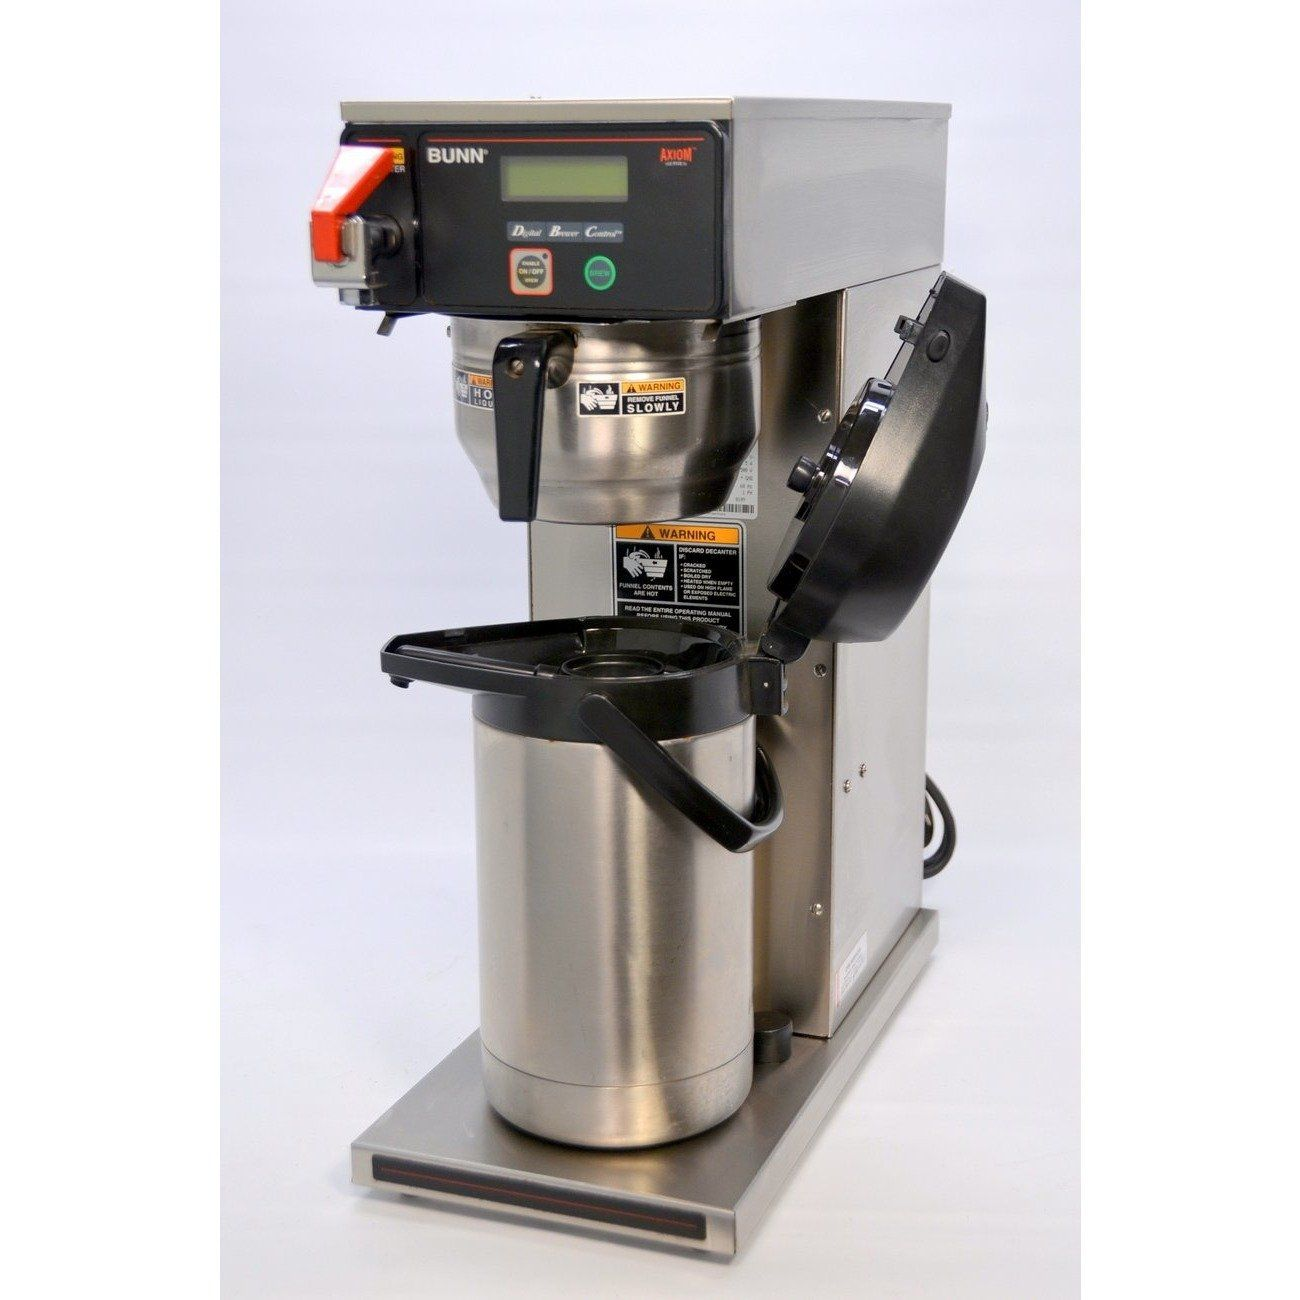 Commercial Espresso Machines eBay Espresso machines